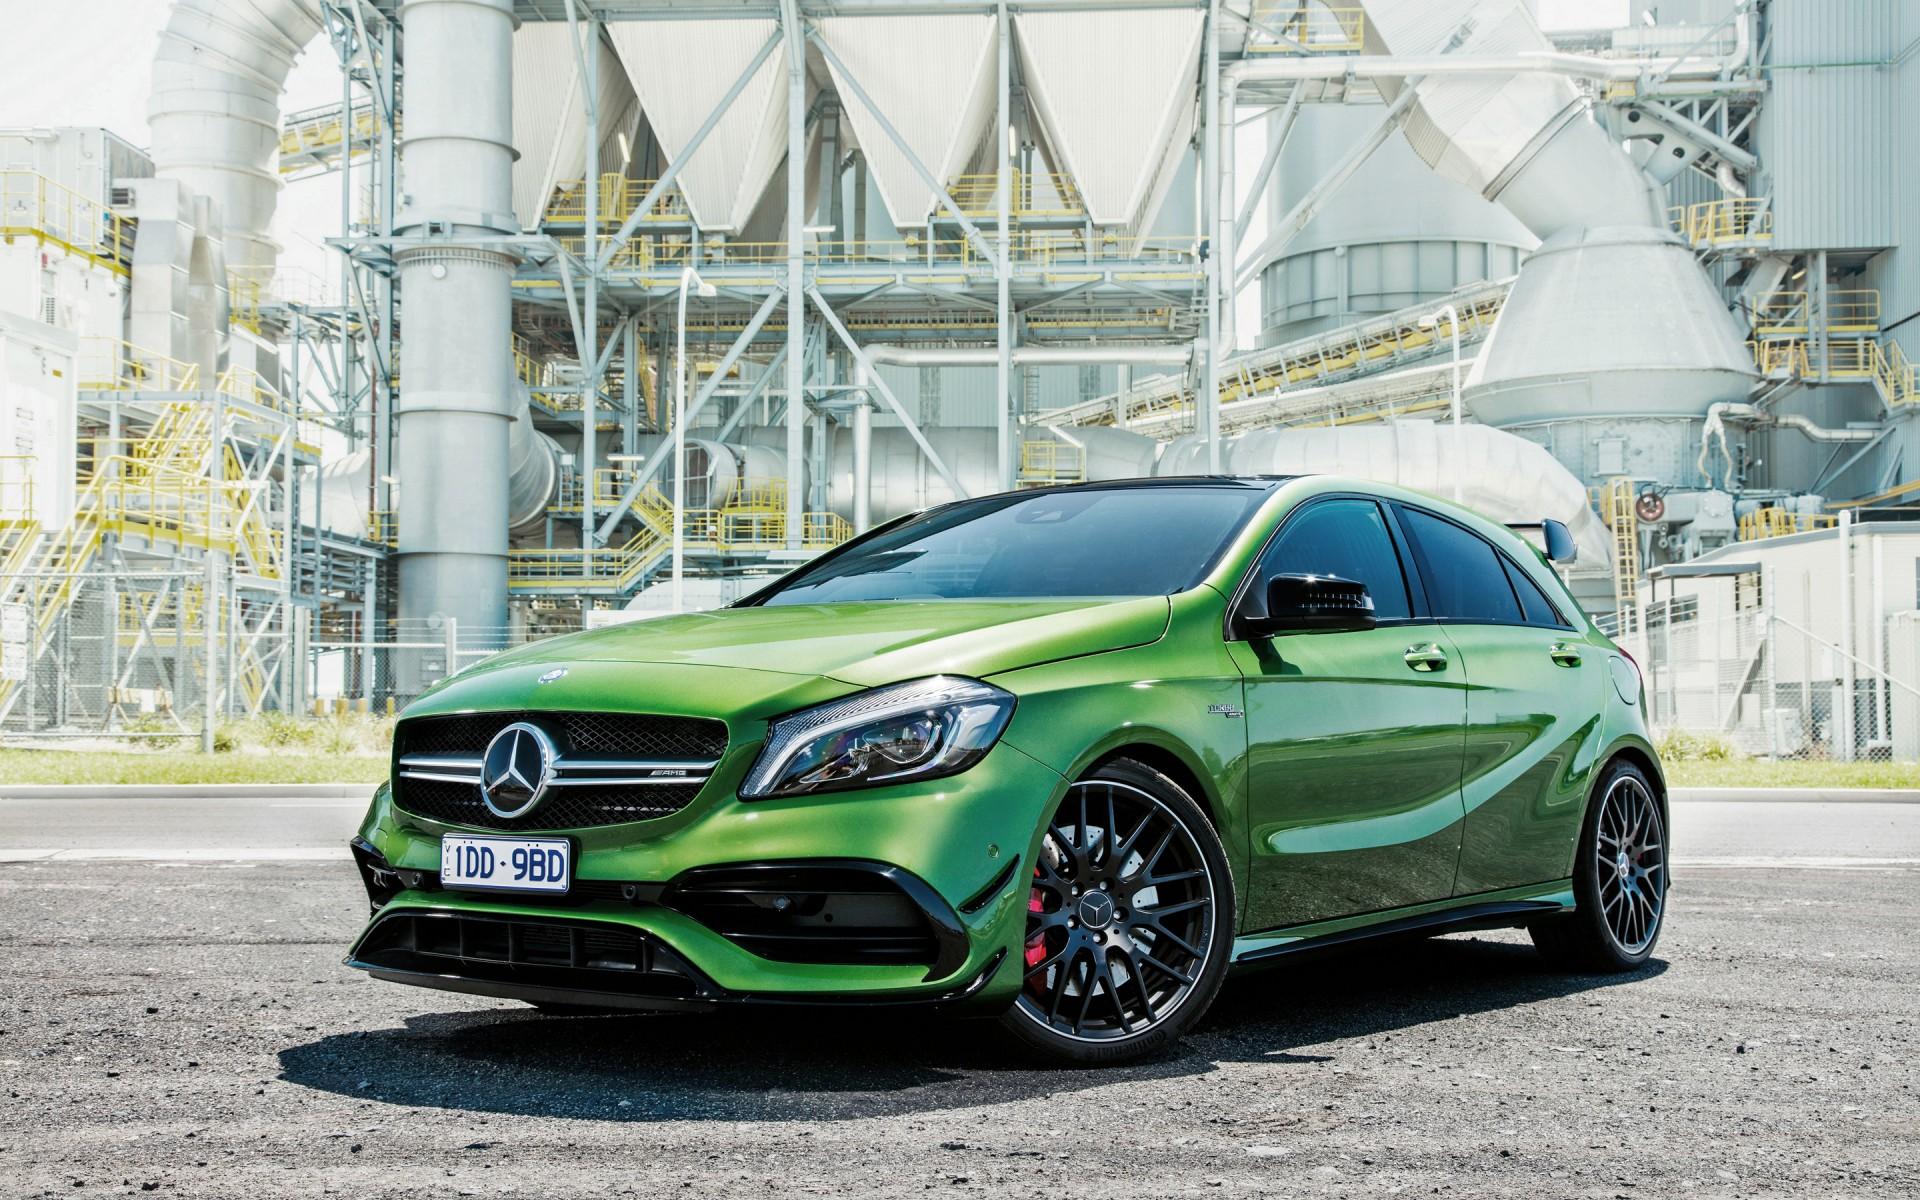 2016 Mercedes Benz A Class A45 Amg 4matic Wallpaper Hd